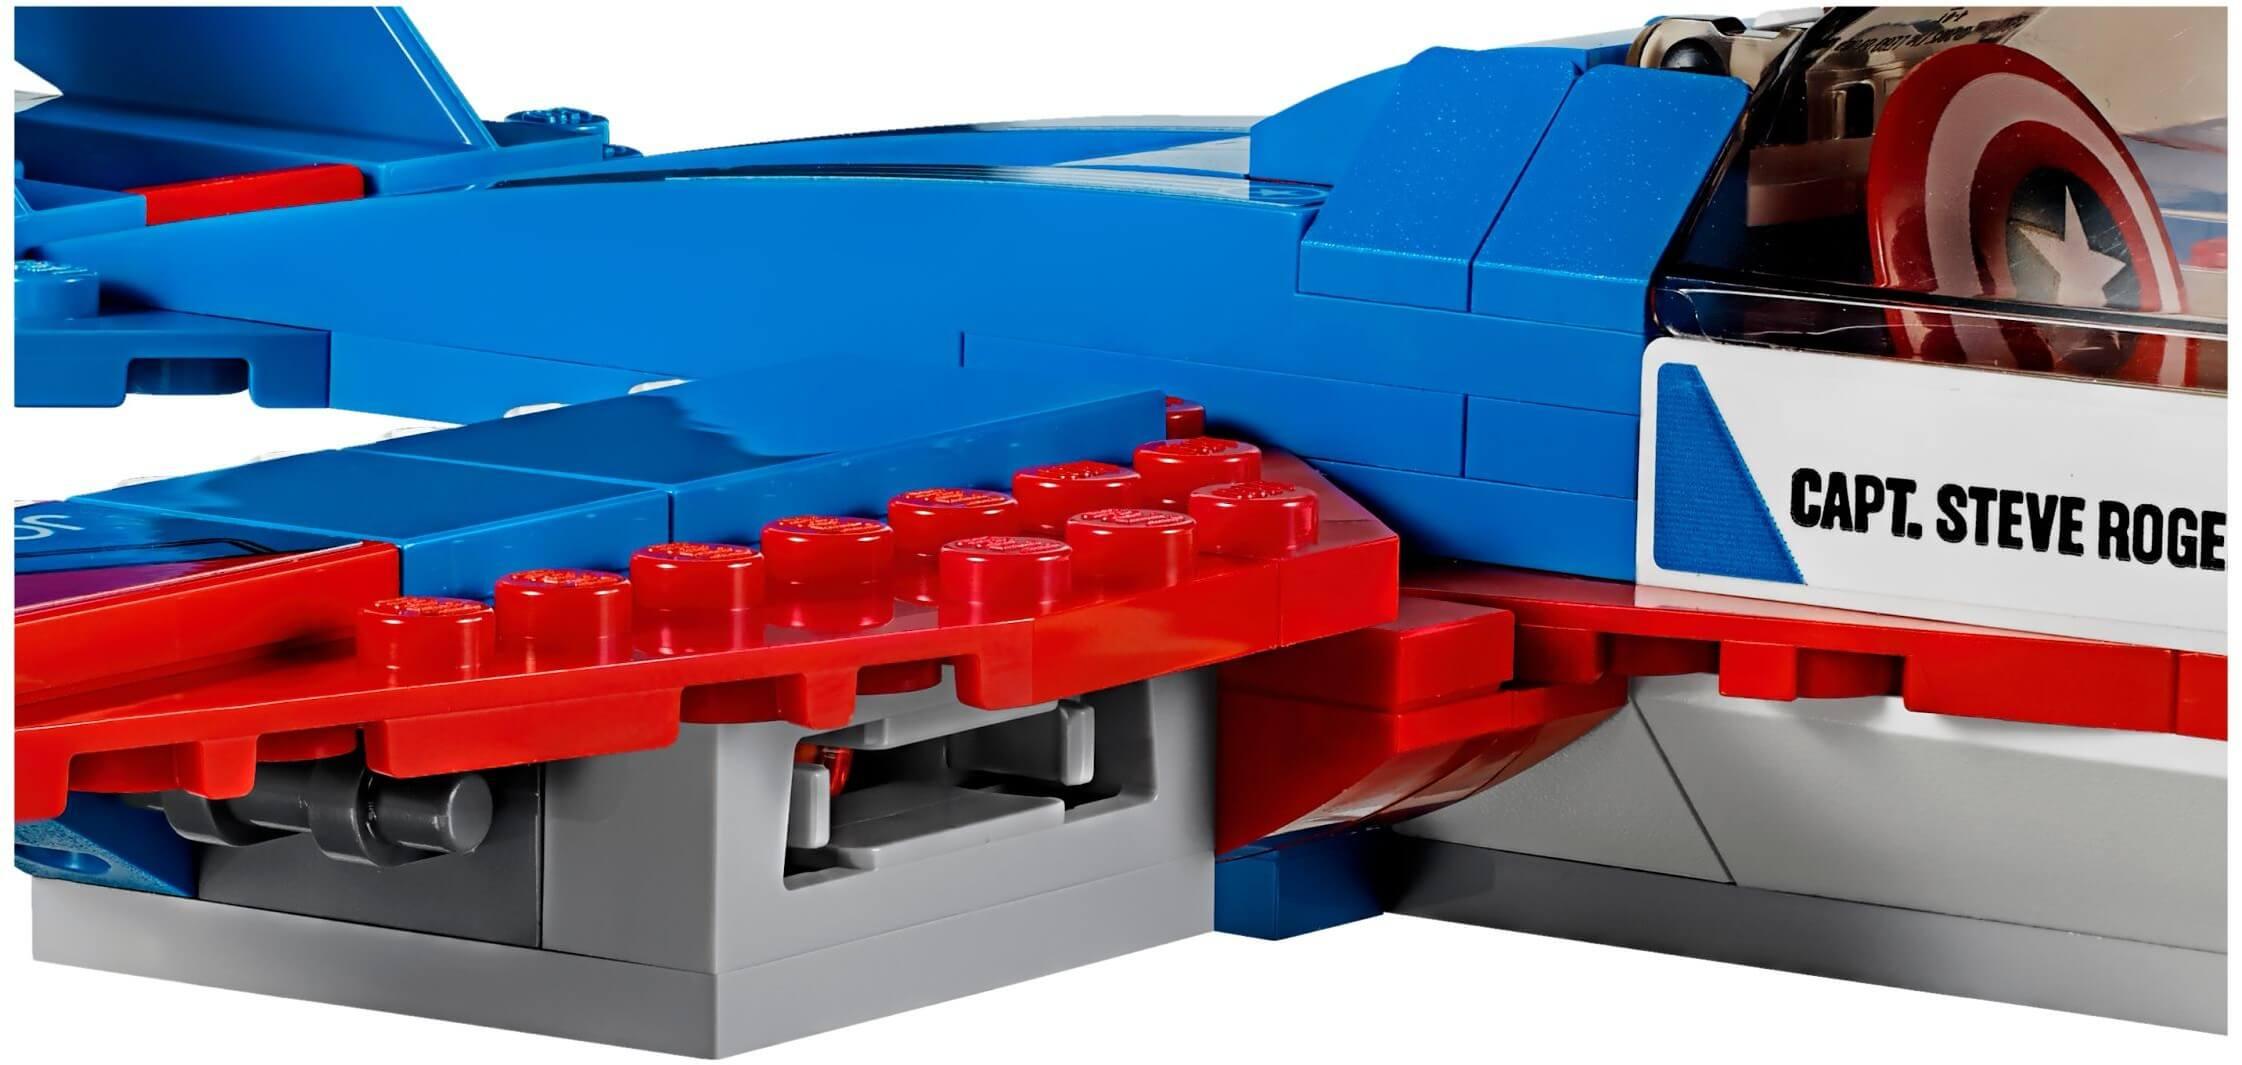 Mua đồ chơi LEGO 76076 - LEGO Marvel Super Heroes 76076 - Máy Bay Phản Lực của Captain America (LEGO 76076 Captain America Jet Pursuit)